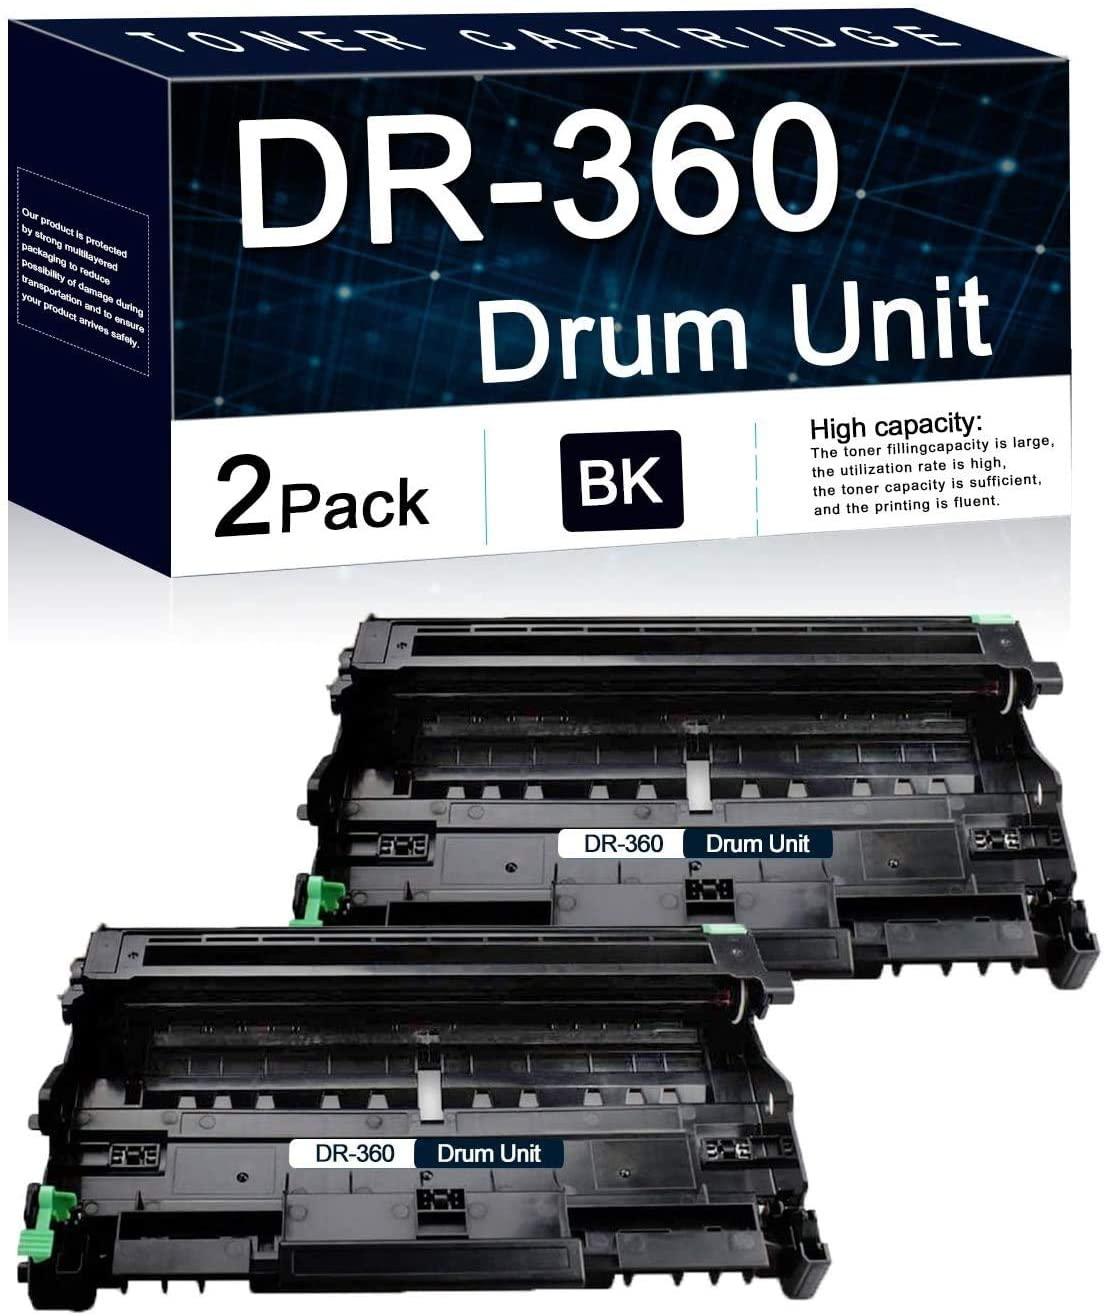 Compatible 2 Pack Black DR-360 Drum Unit Used for Brother DCP-7030 7040 7045N HL-2120 2150 2150N 2170 2170W MFC-7040 7320 7345N 7440 7440N 7840 7840W Printers.